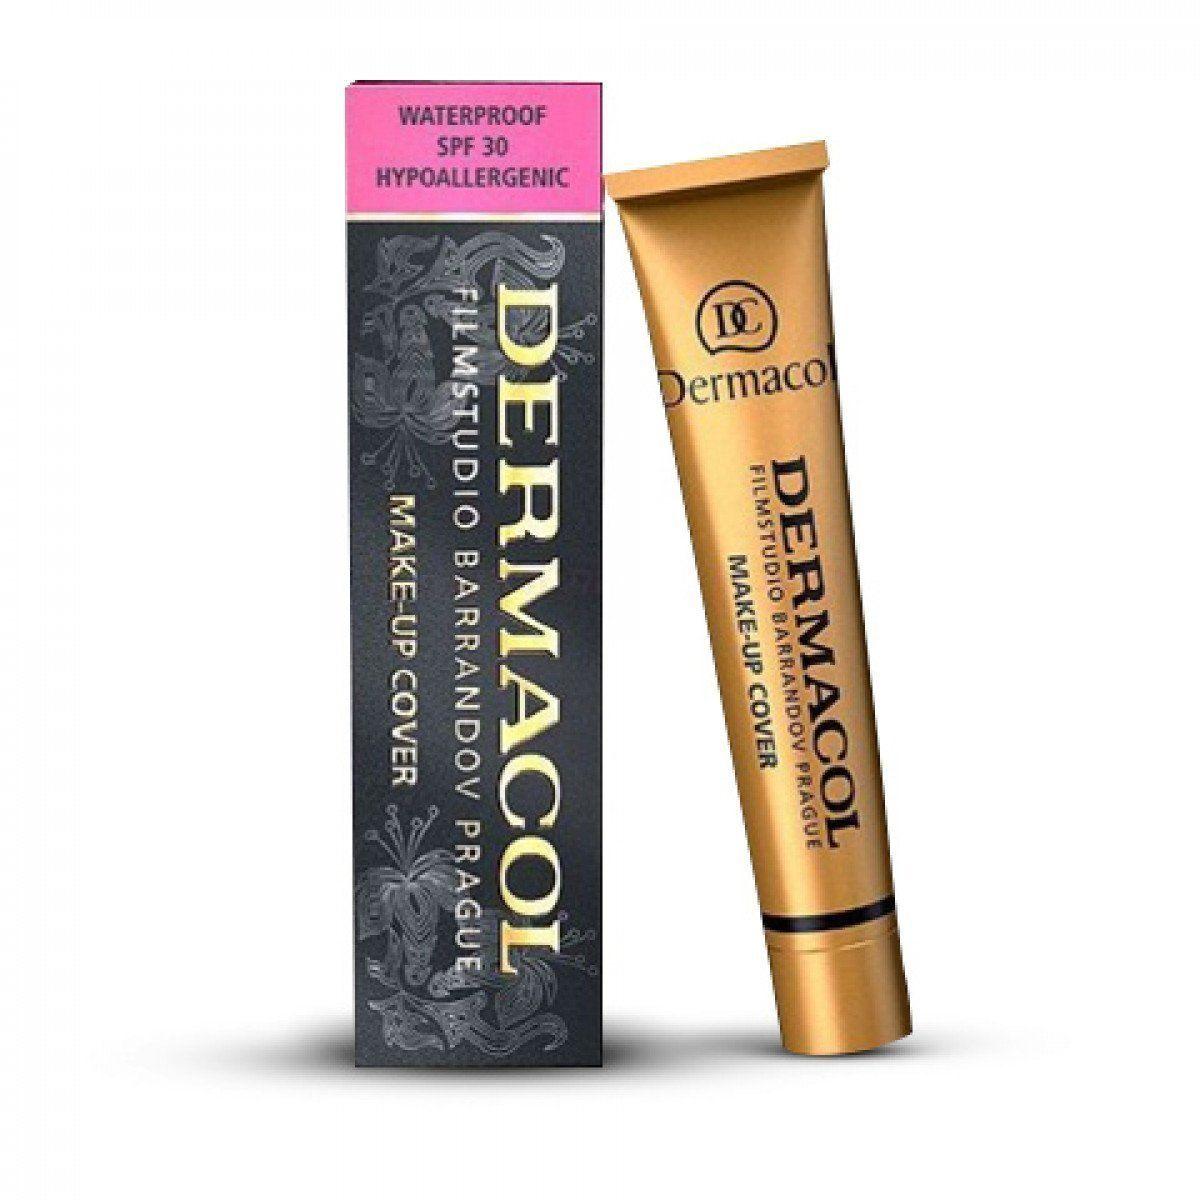 Dermacol Film Studio Makeup Cover Foundation 30g Cover